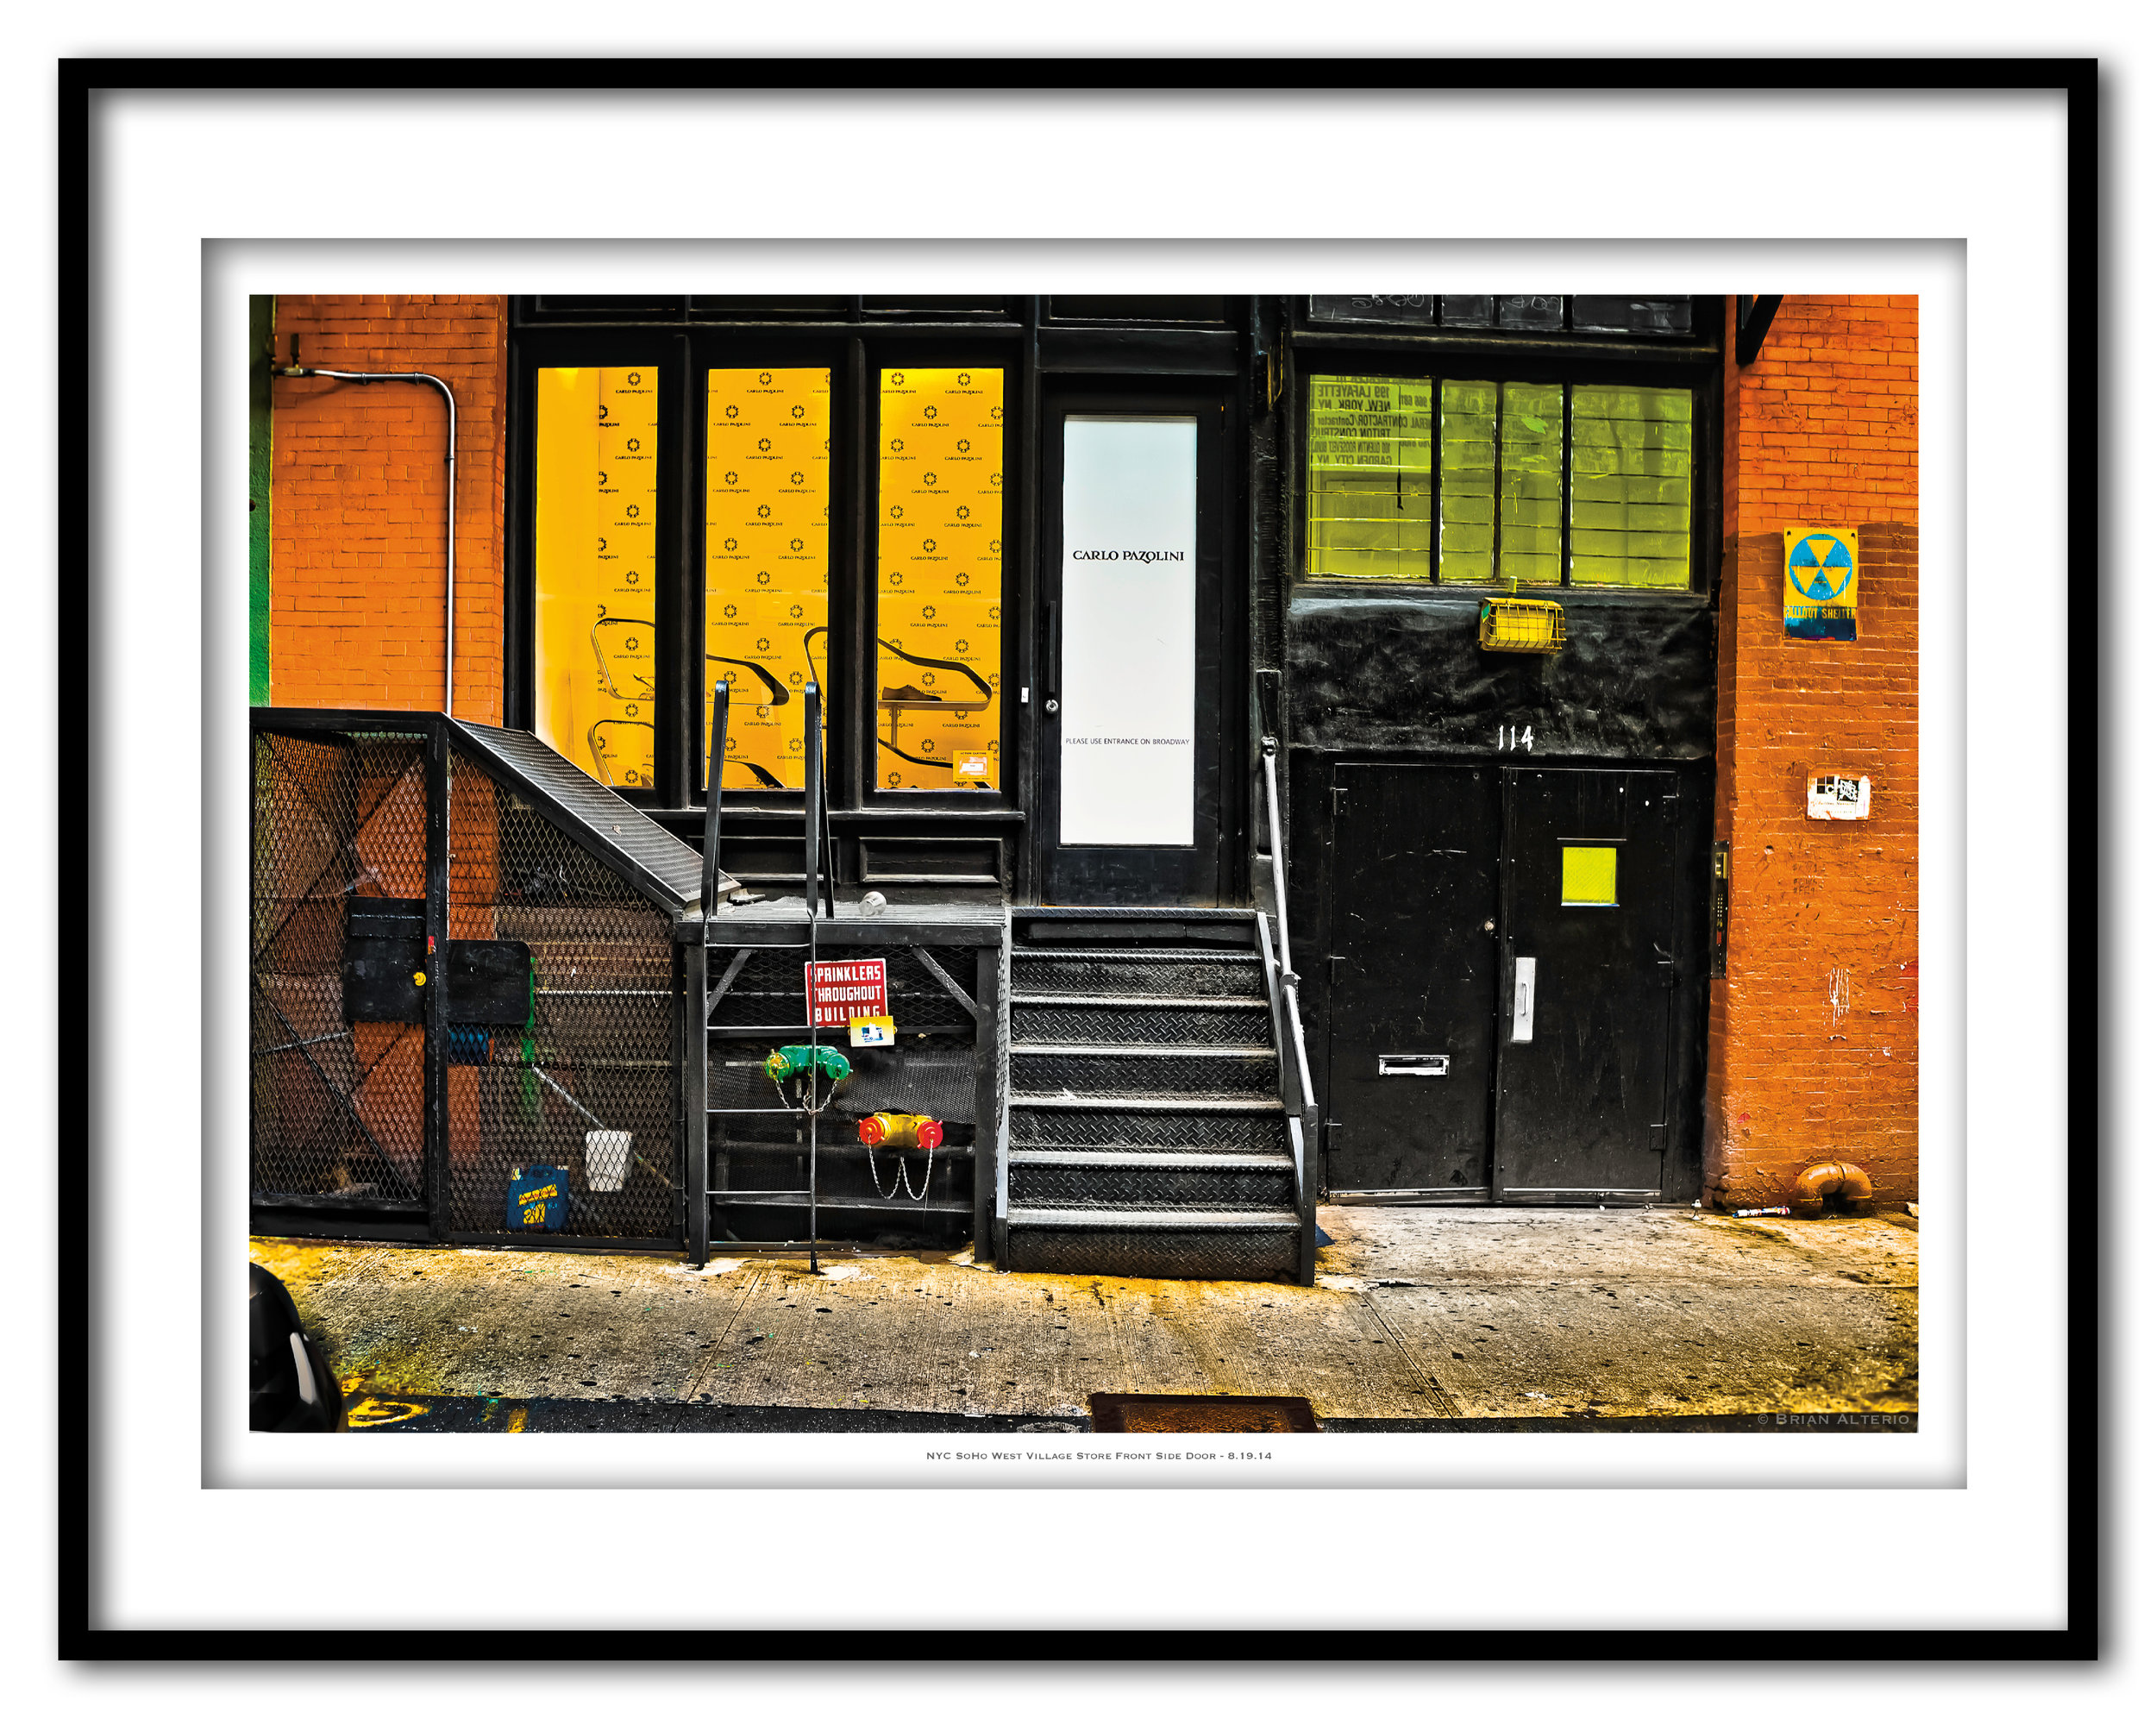 NYC SoHo West Village Store Front Side Door - 8.19.14 - Framed.jpg